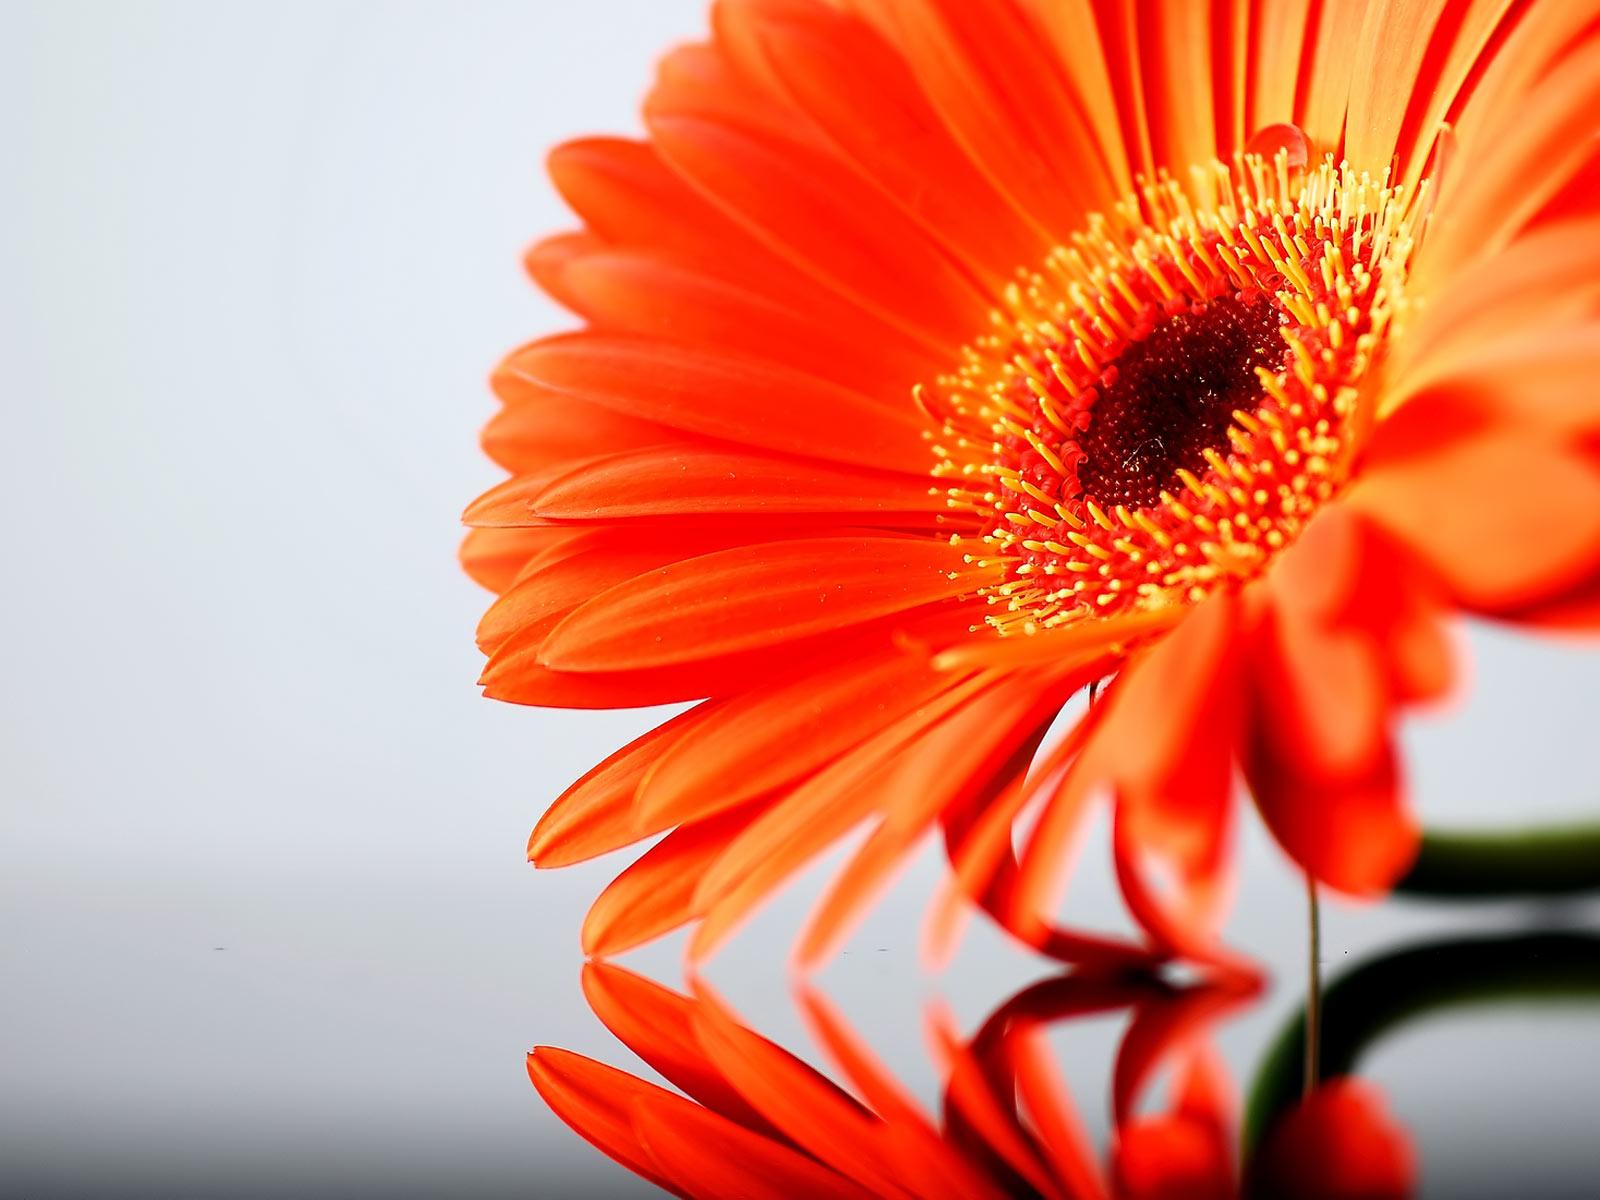 download image orange and - photo #33